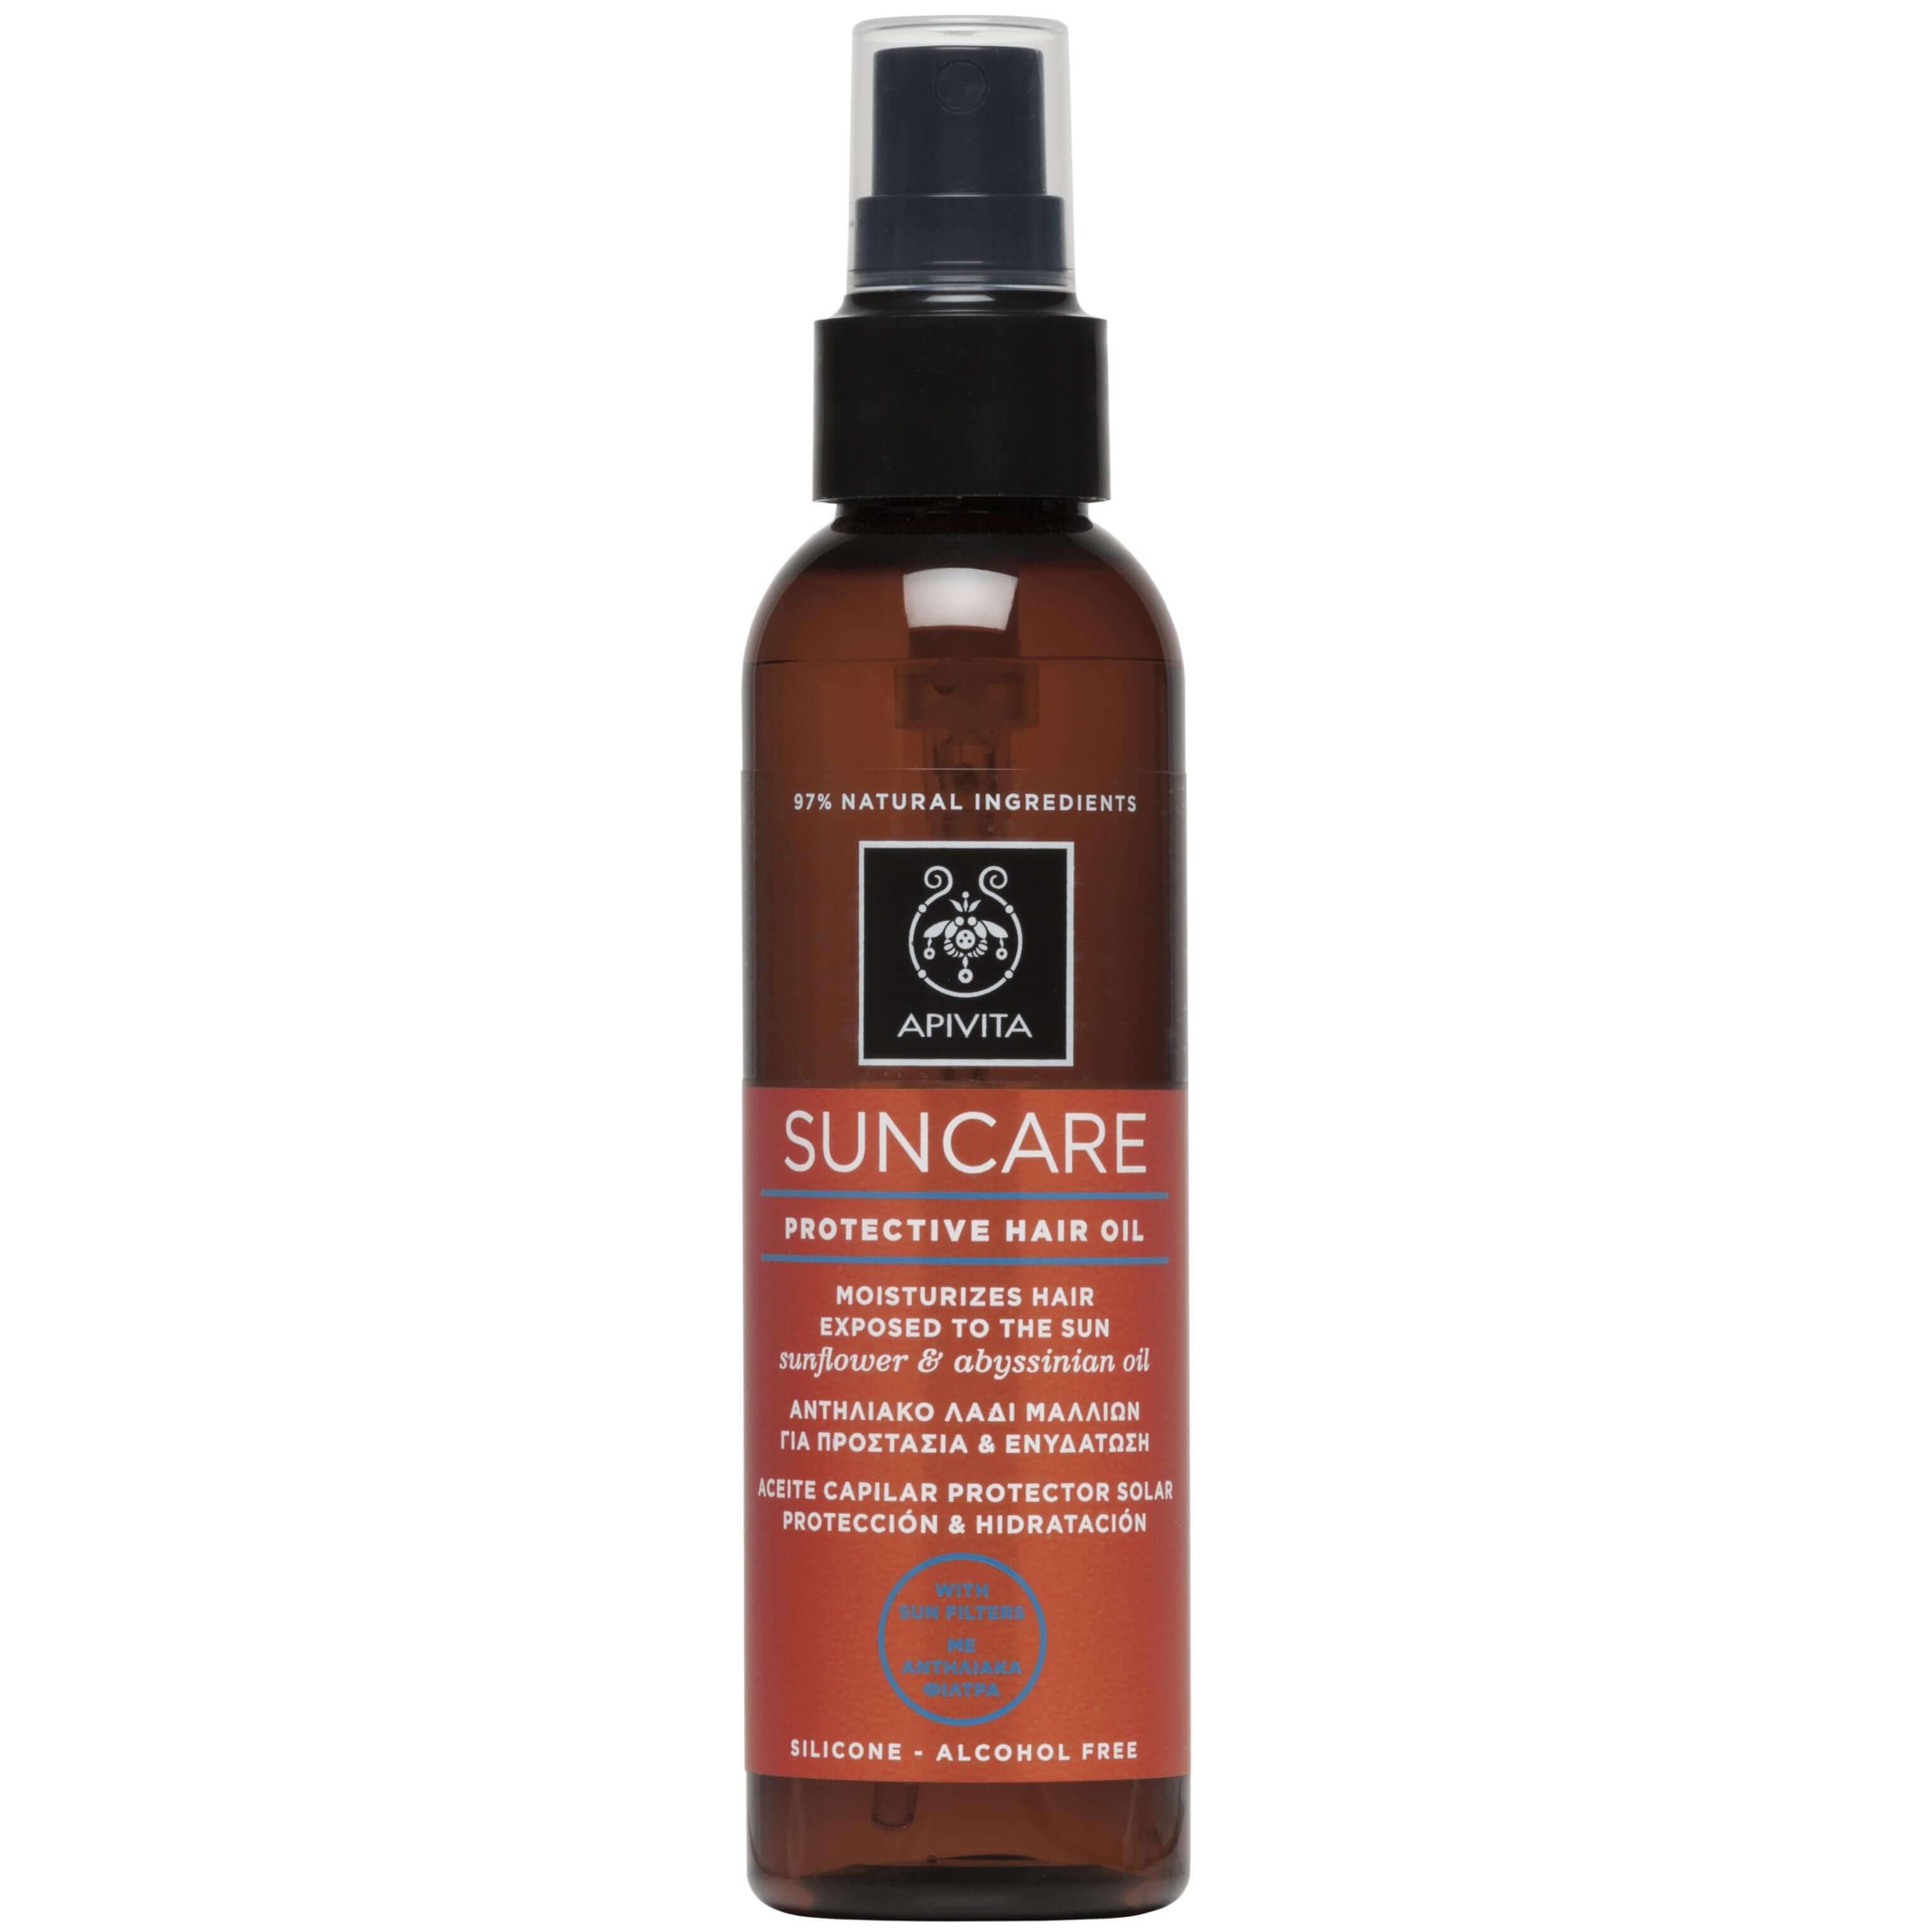 Apivita Suncare Protective Hair Oil Αντηλιακό Λάδι Μαλλιών Για Προστασία Και Ενυδάτωση 150ml